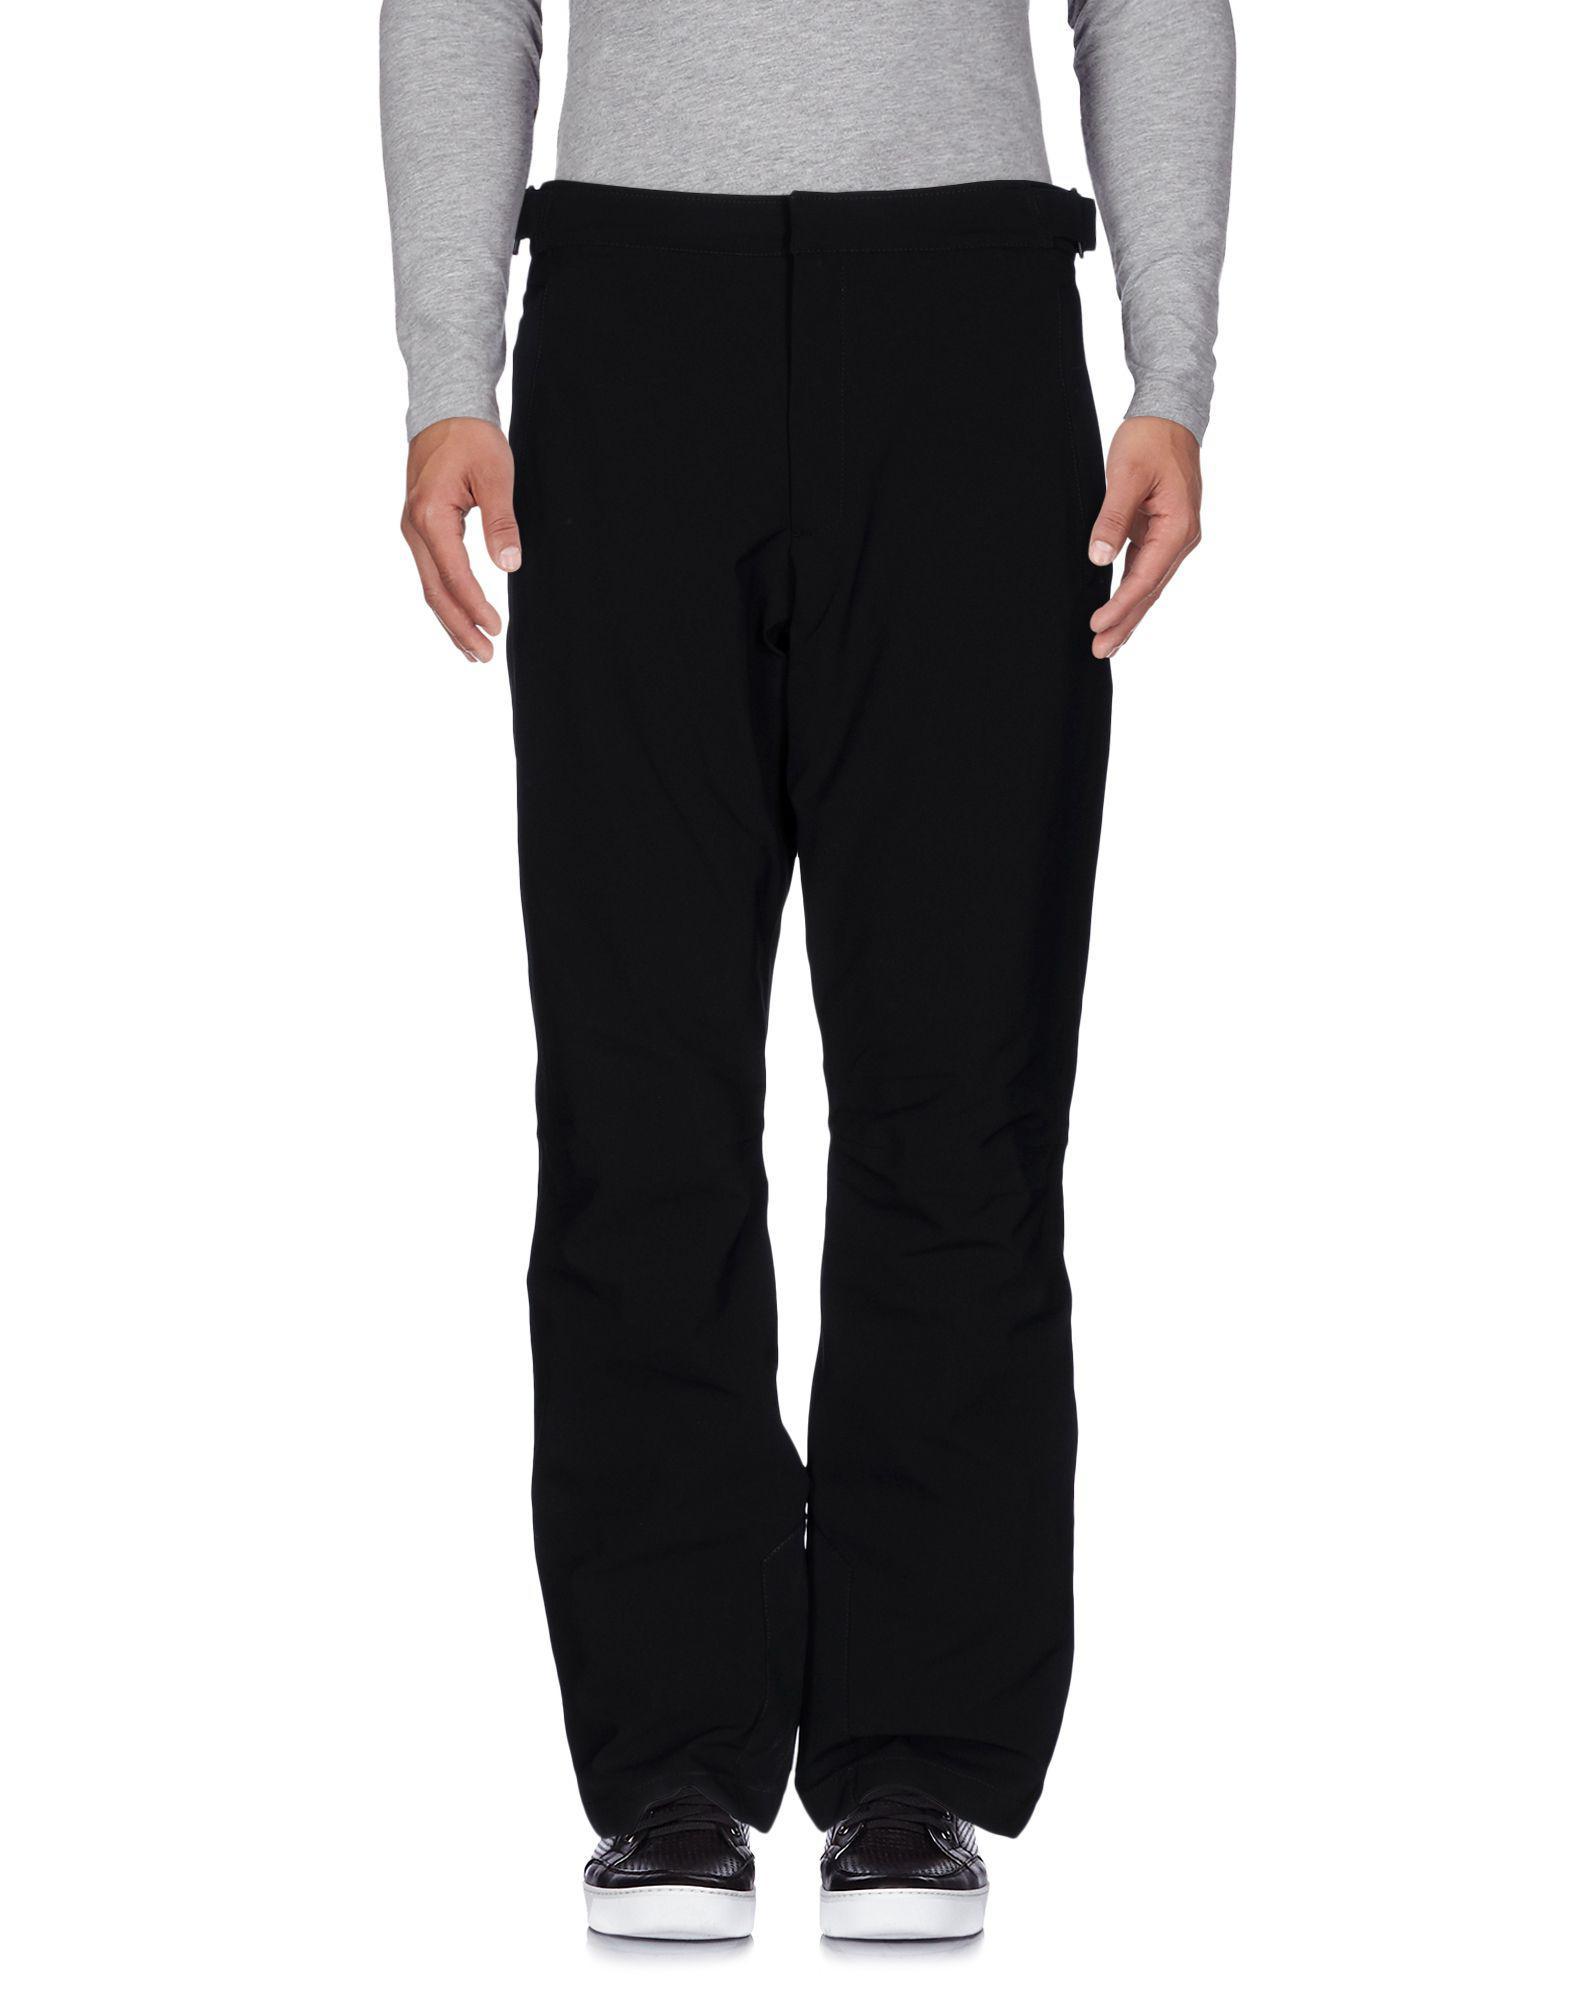 02abebdd Men's Black Ski Pants